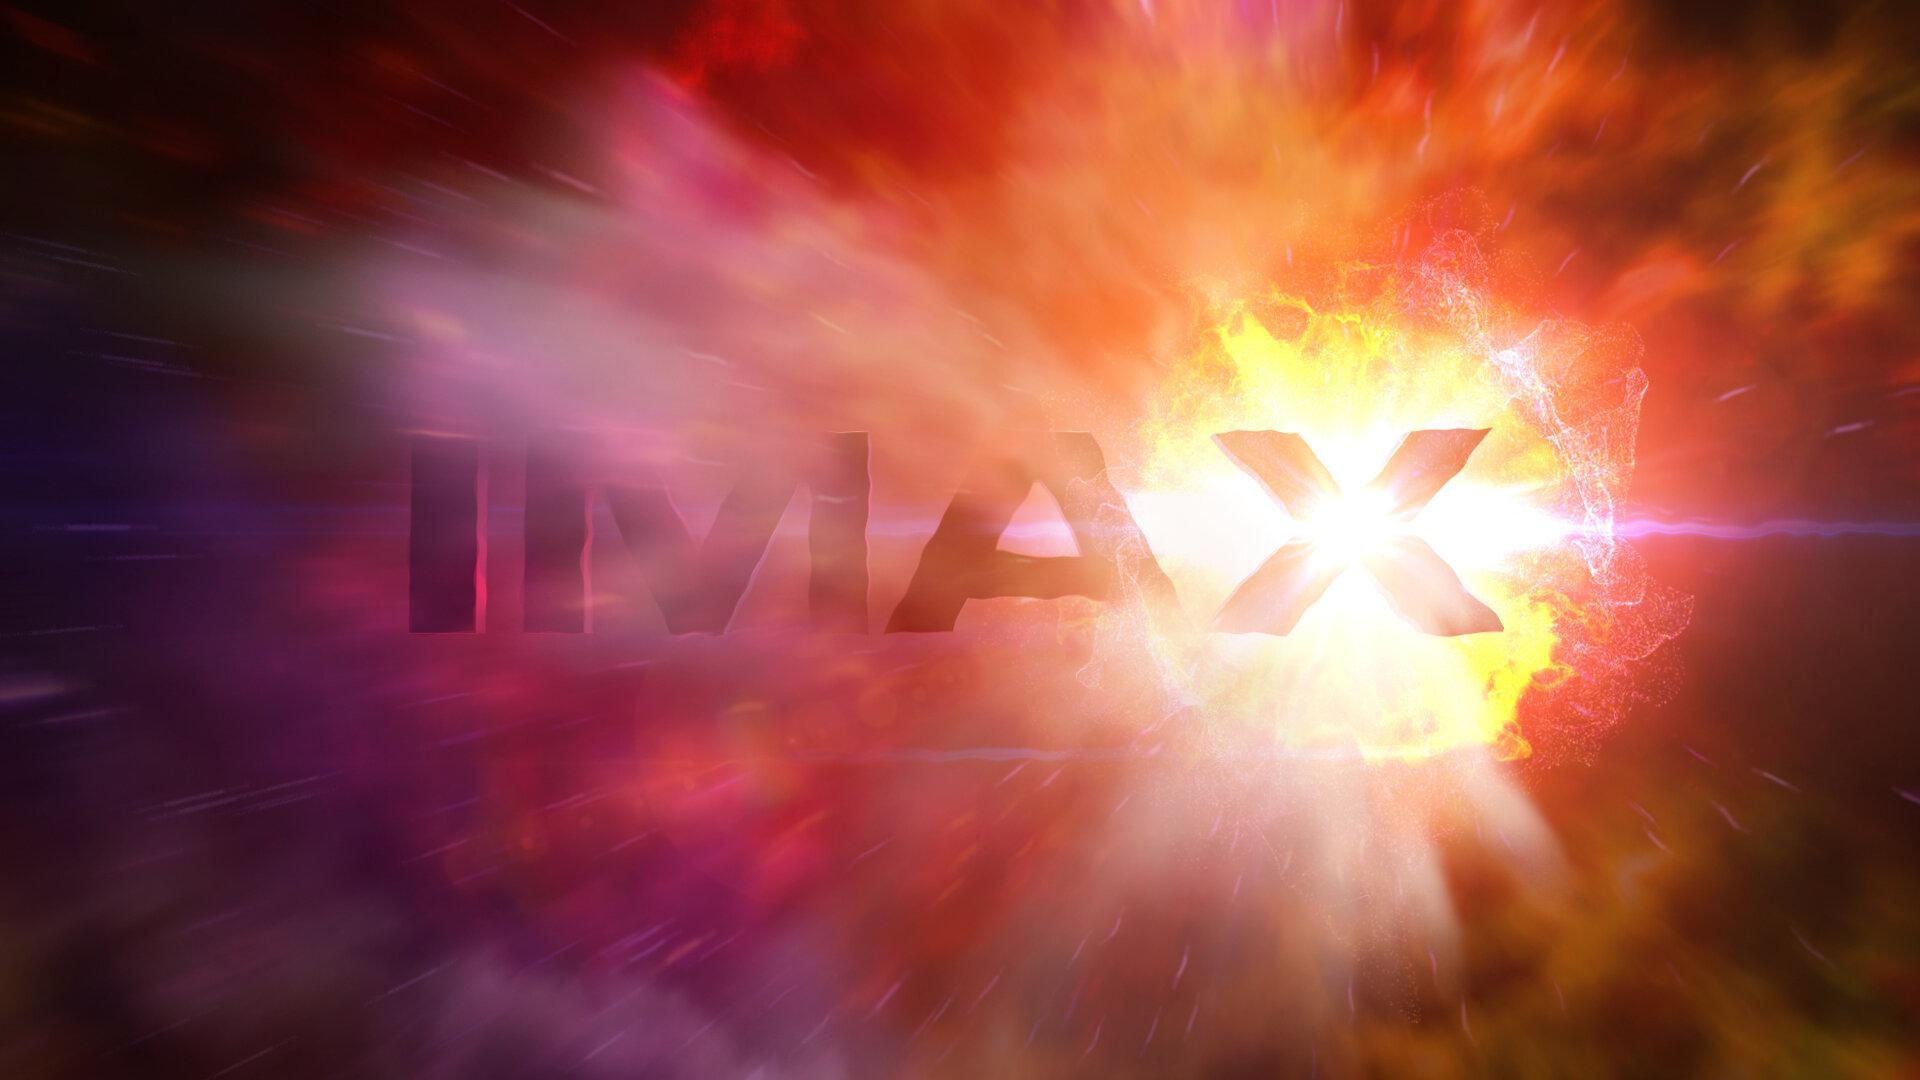 IMAX_DP_BL_03_03.jpg